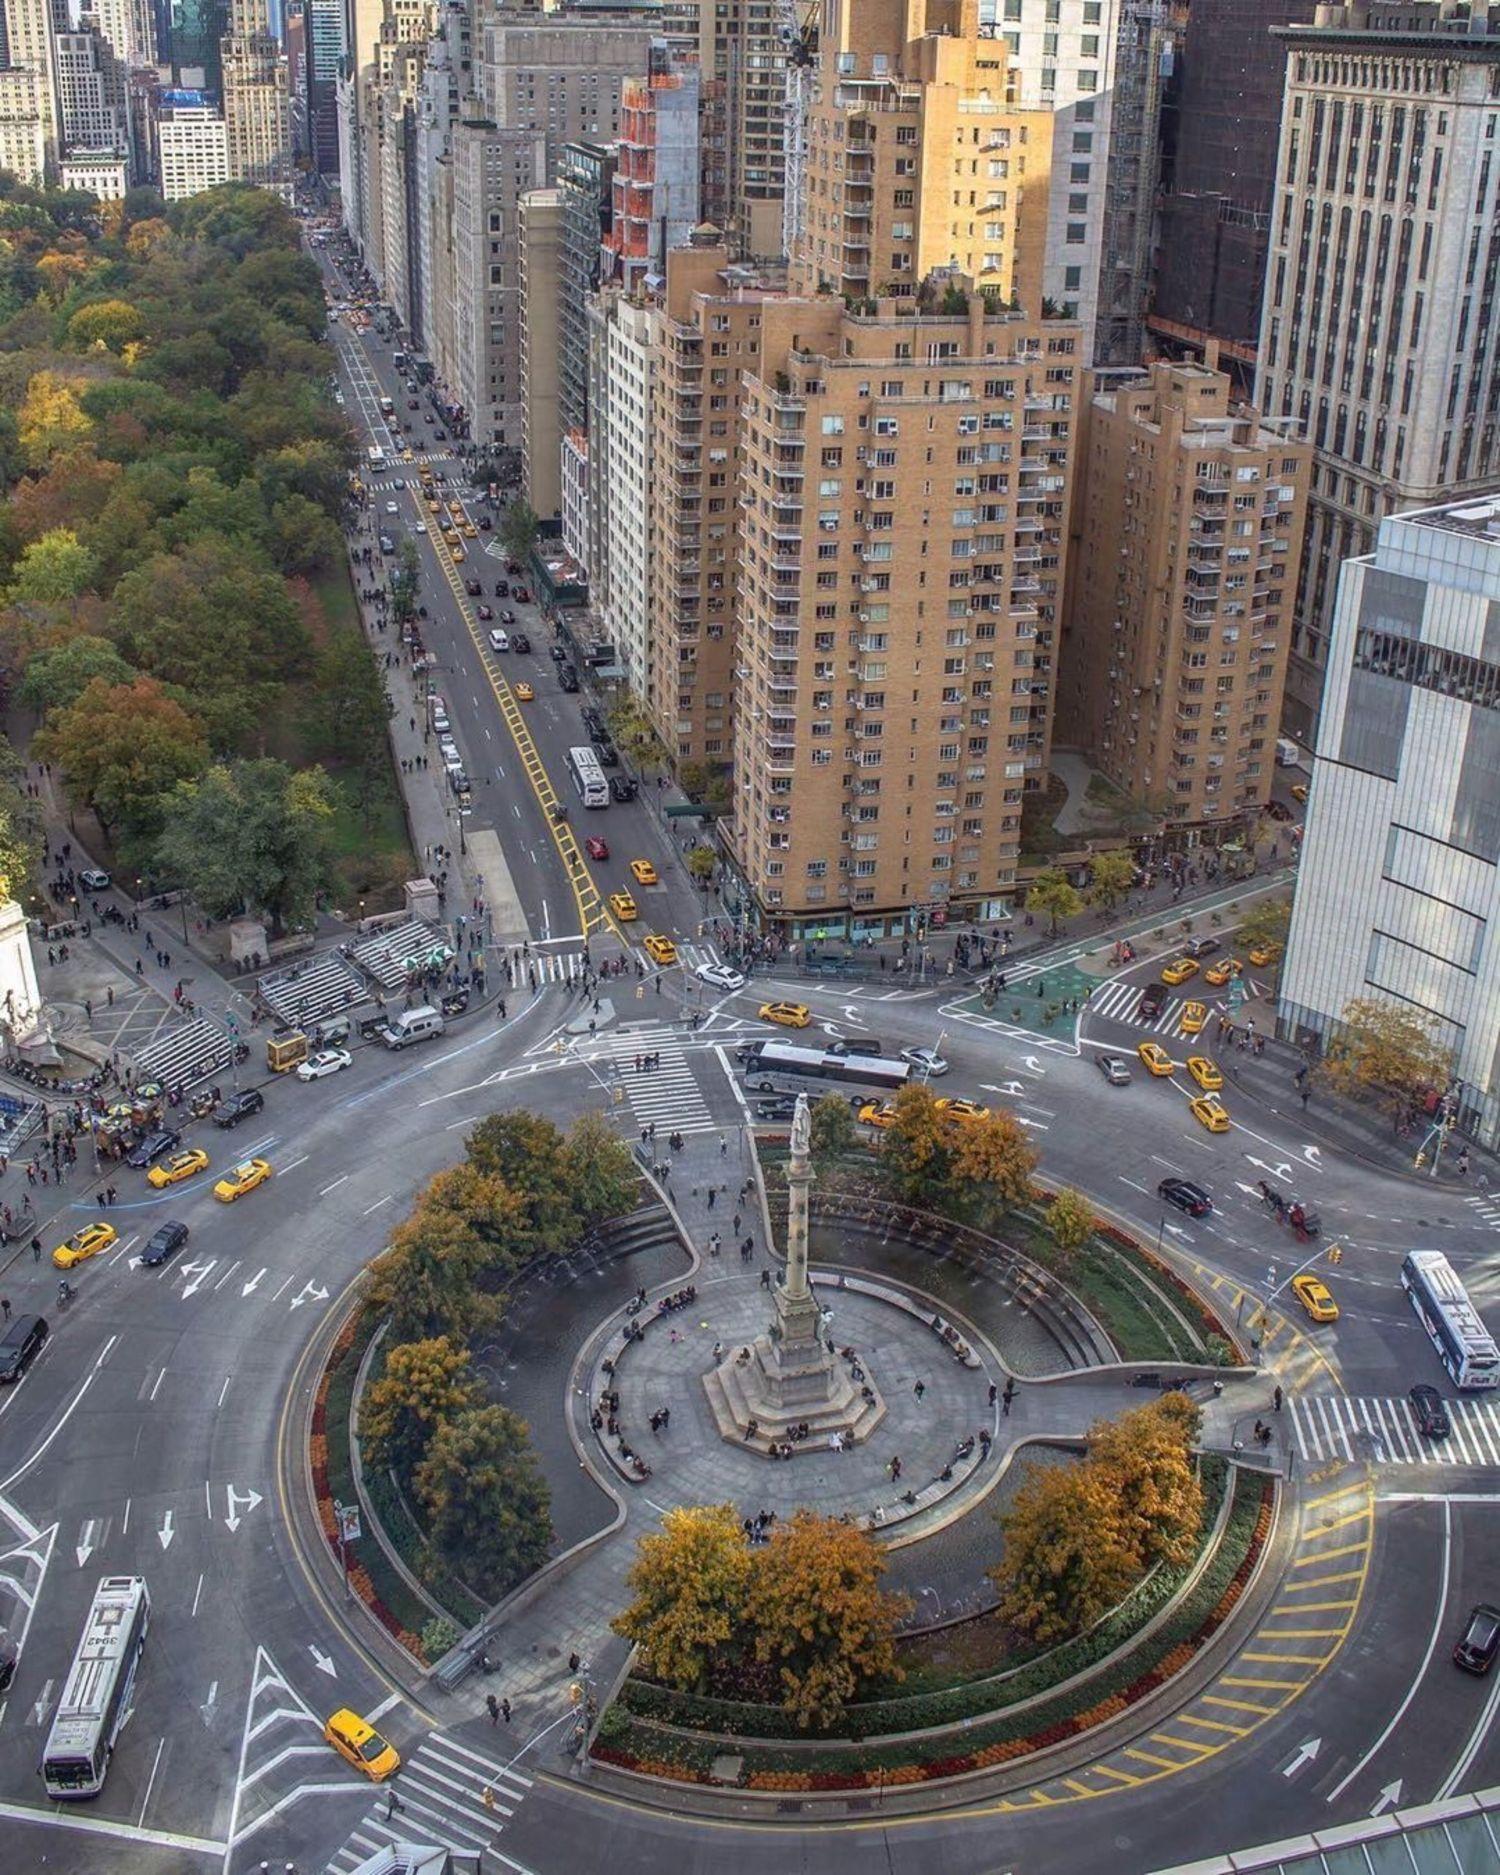 Columbus Circle, Manhattan. Photo via @newyorkcitykopp #viewingnyc #nyc #newyork #newyorkcity #columbuscircle